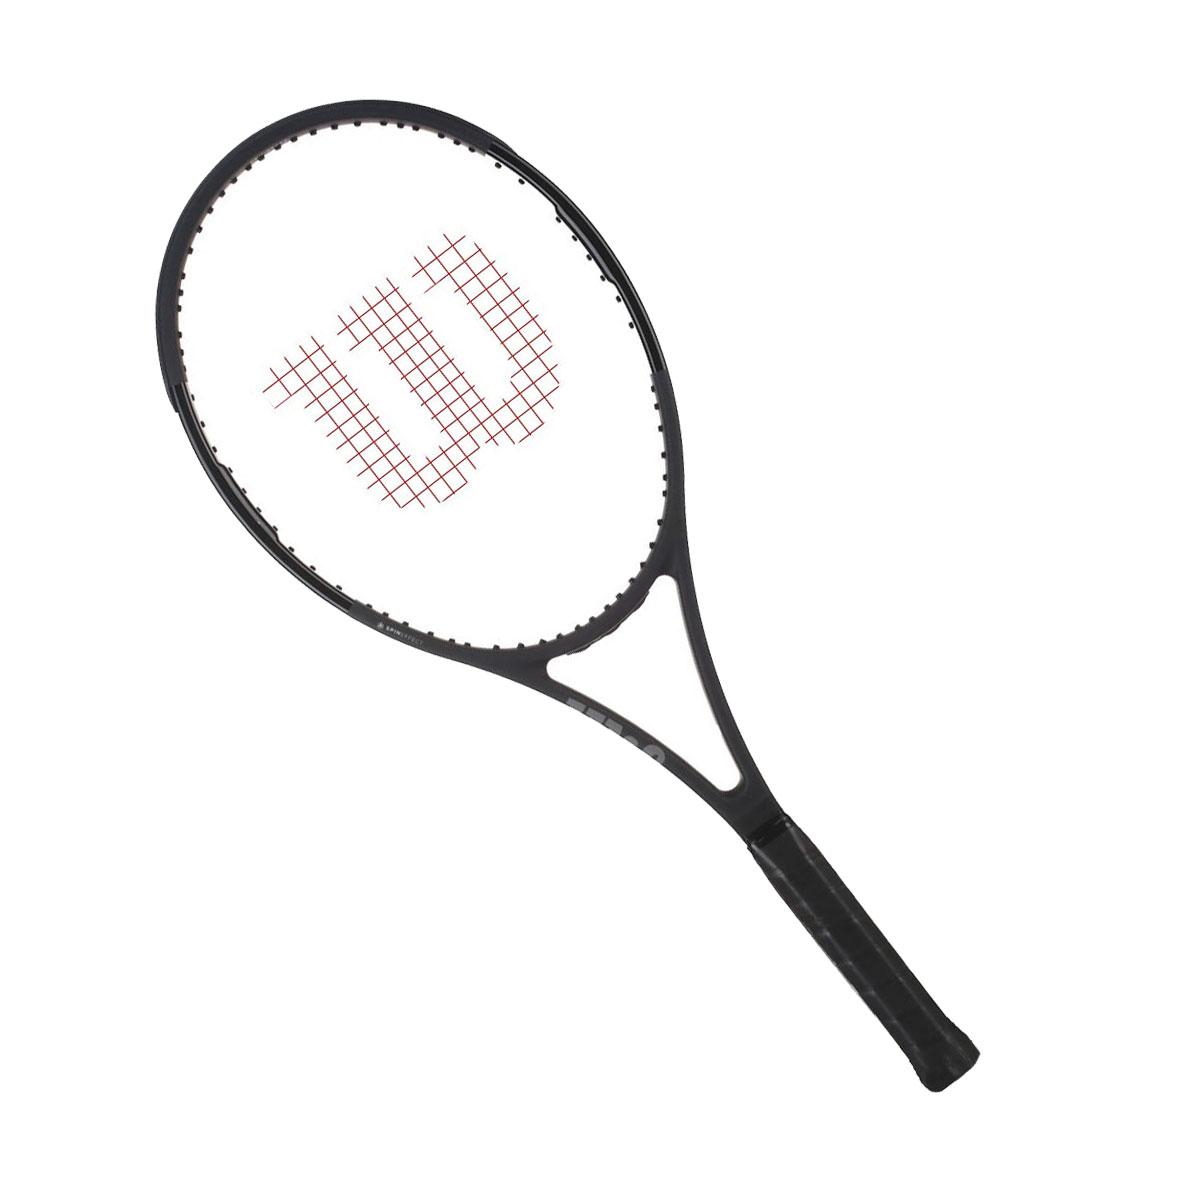 raquete de t nis wilson pro staff 97 ls emp rio do tenista. Black Bedroom Furniture Sets. Home Design Ideas